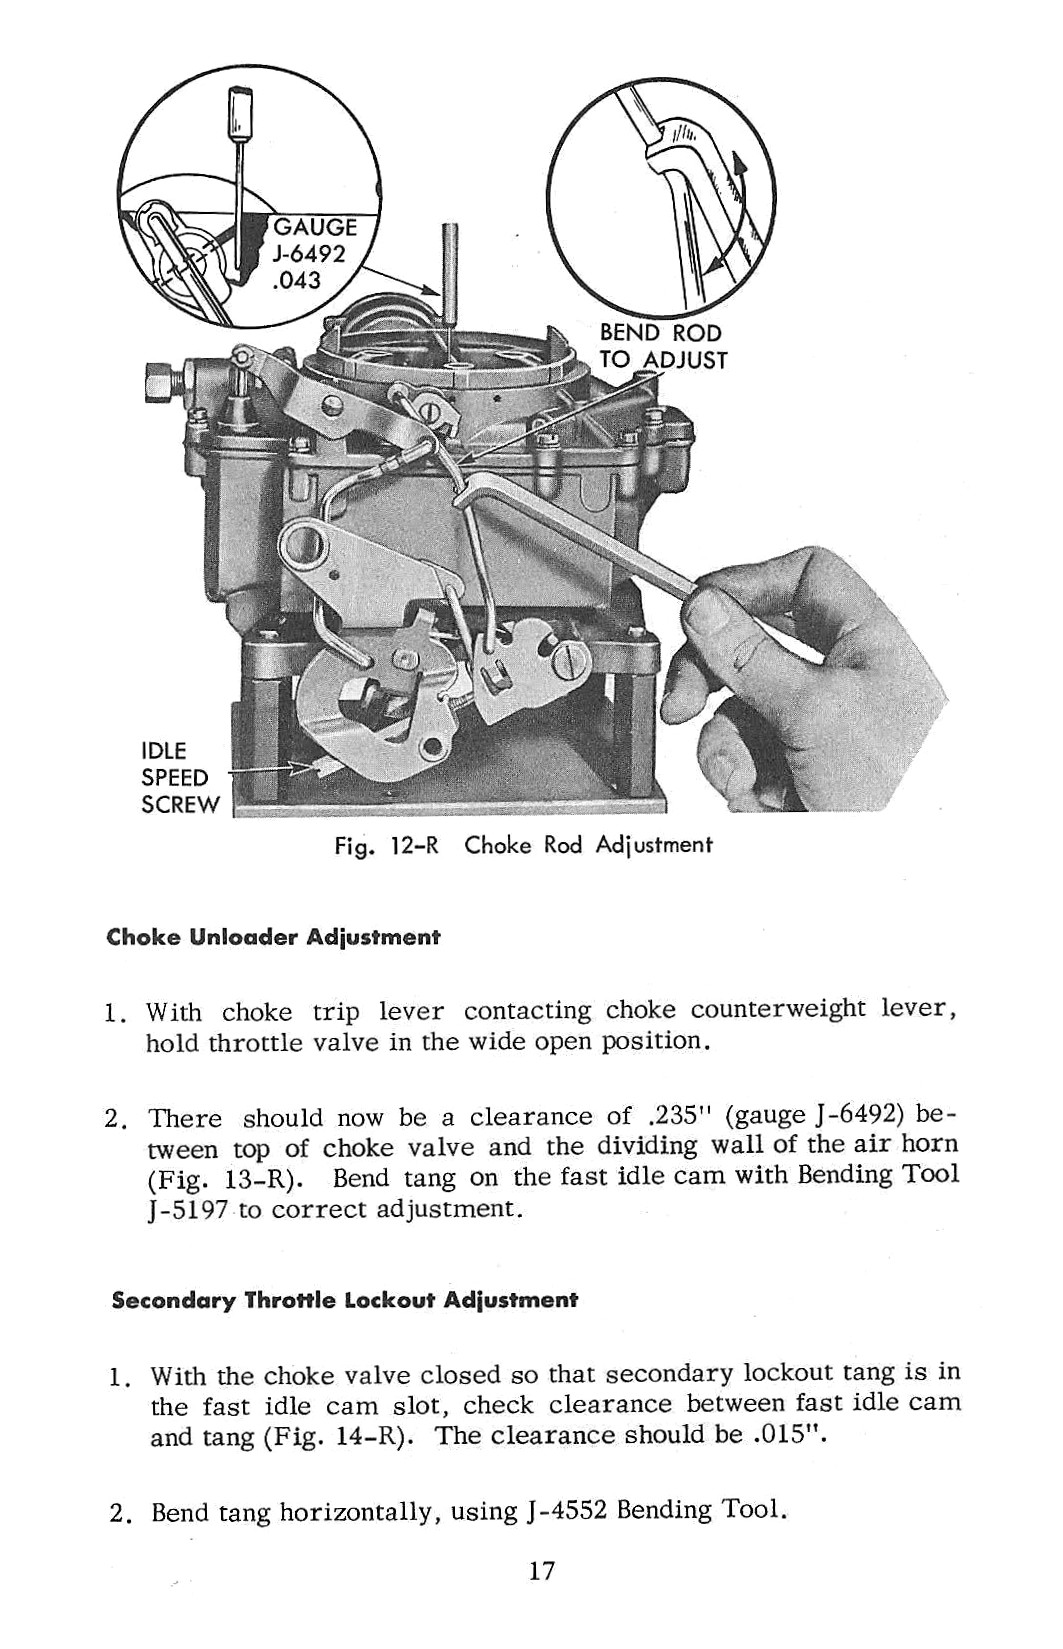 1956 Chevrolet - Four Barrel Carburetor - Single and Duel